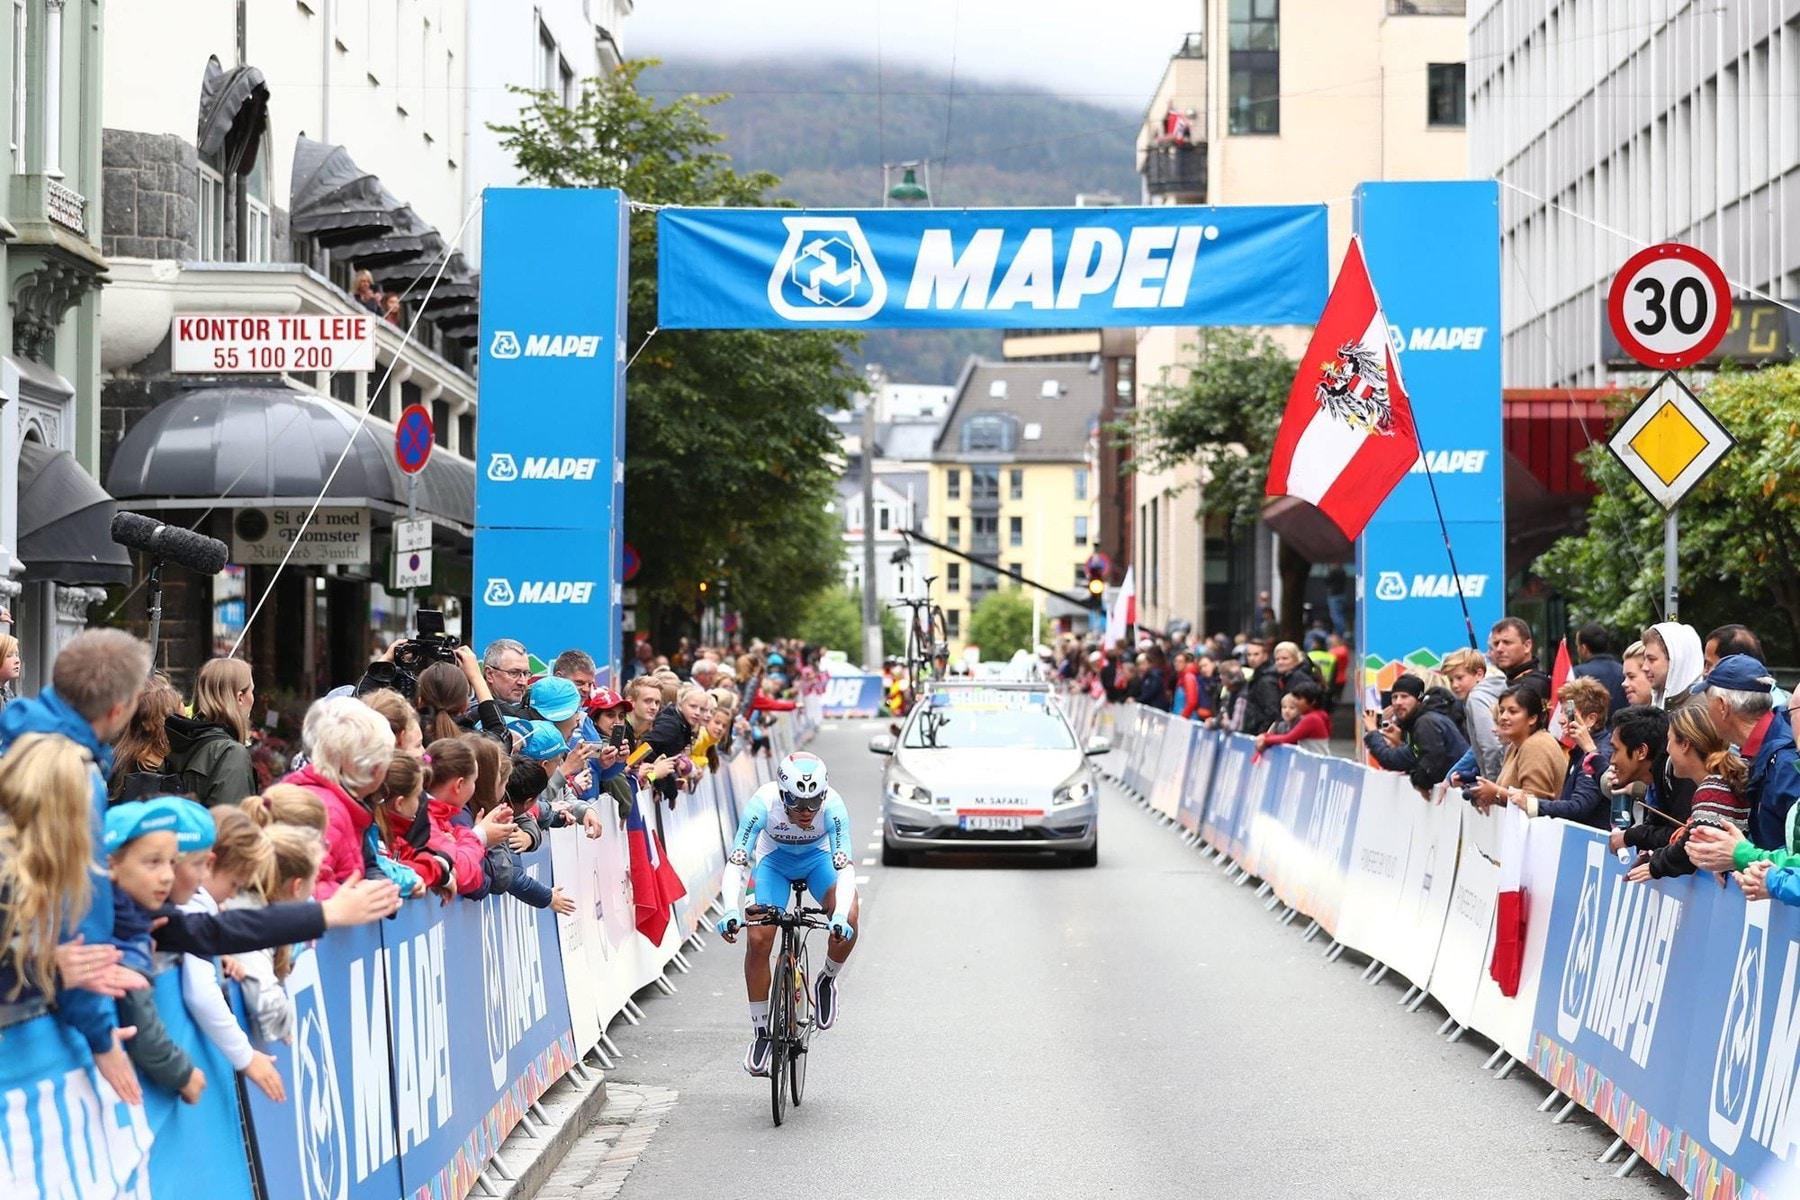 Sagan-mapei-uci-championship (3)